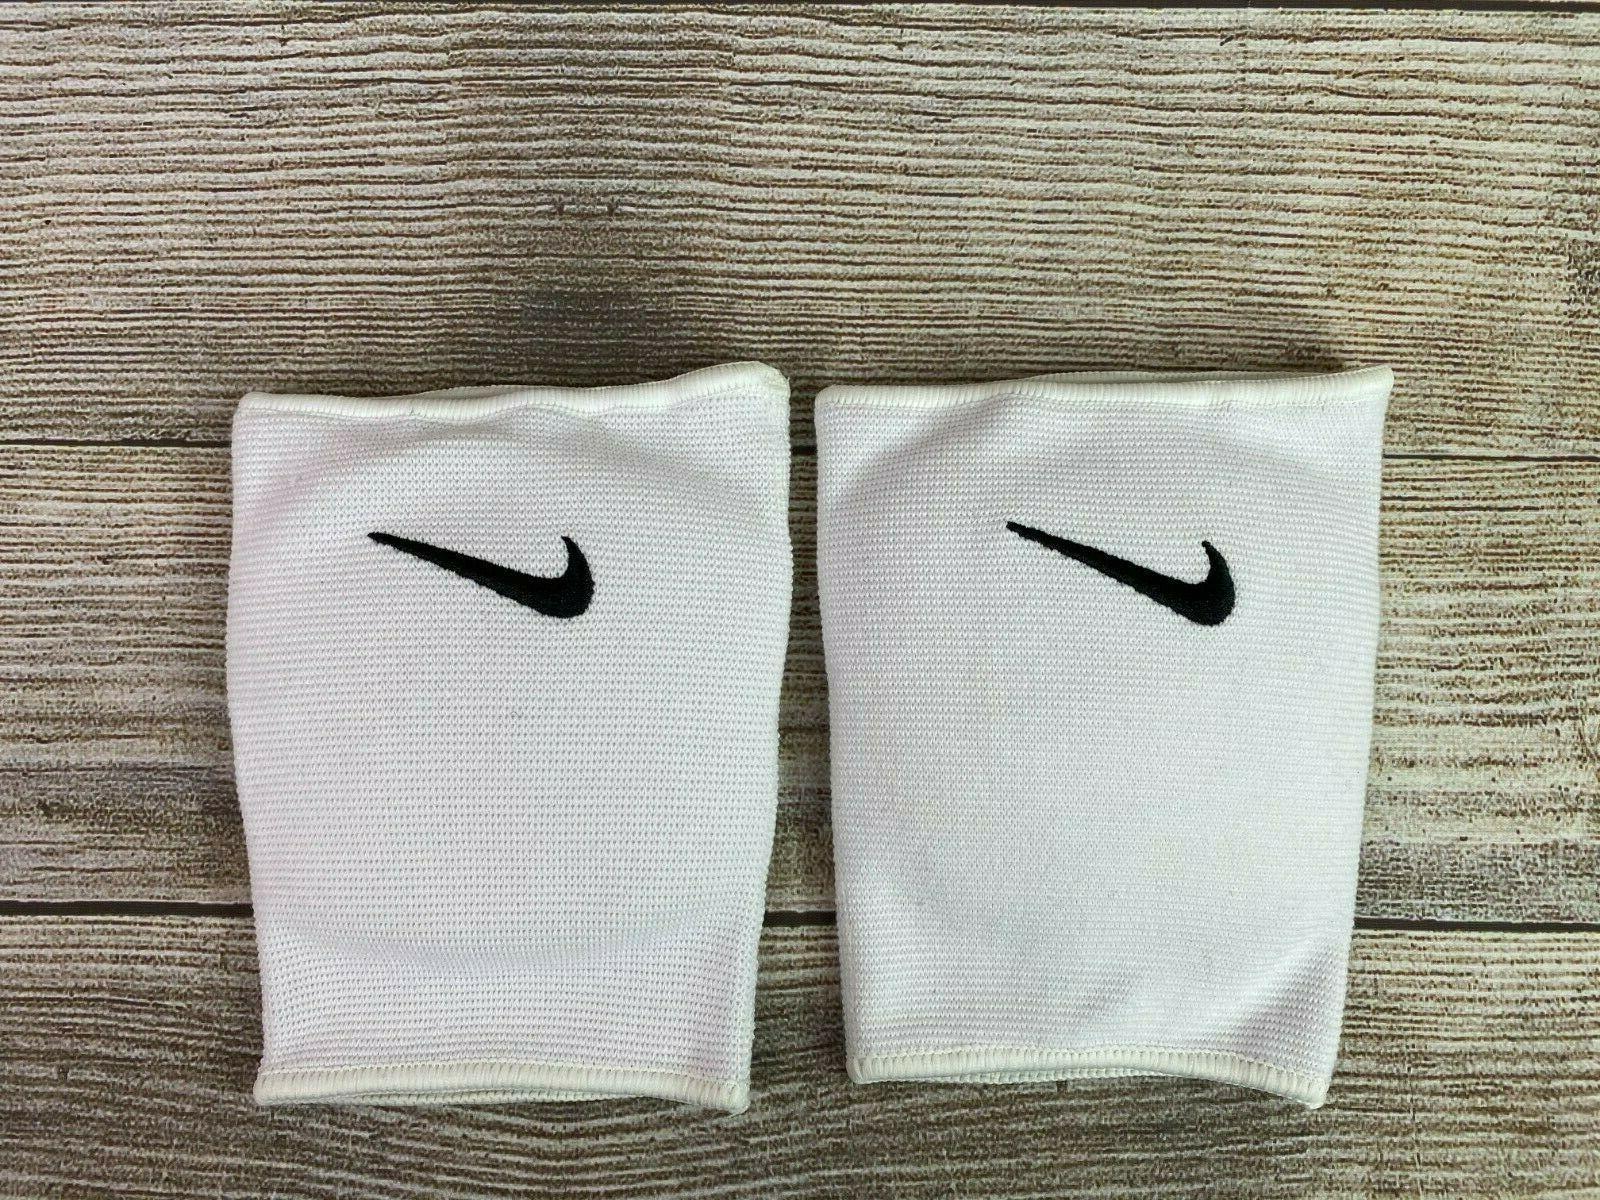 Nike Medium/Large Volleyball Pads